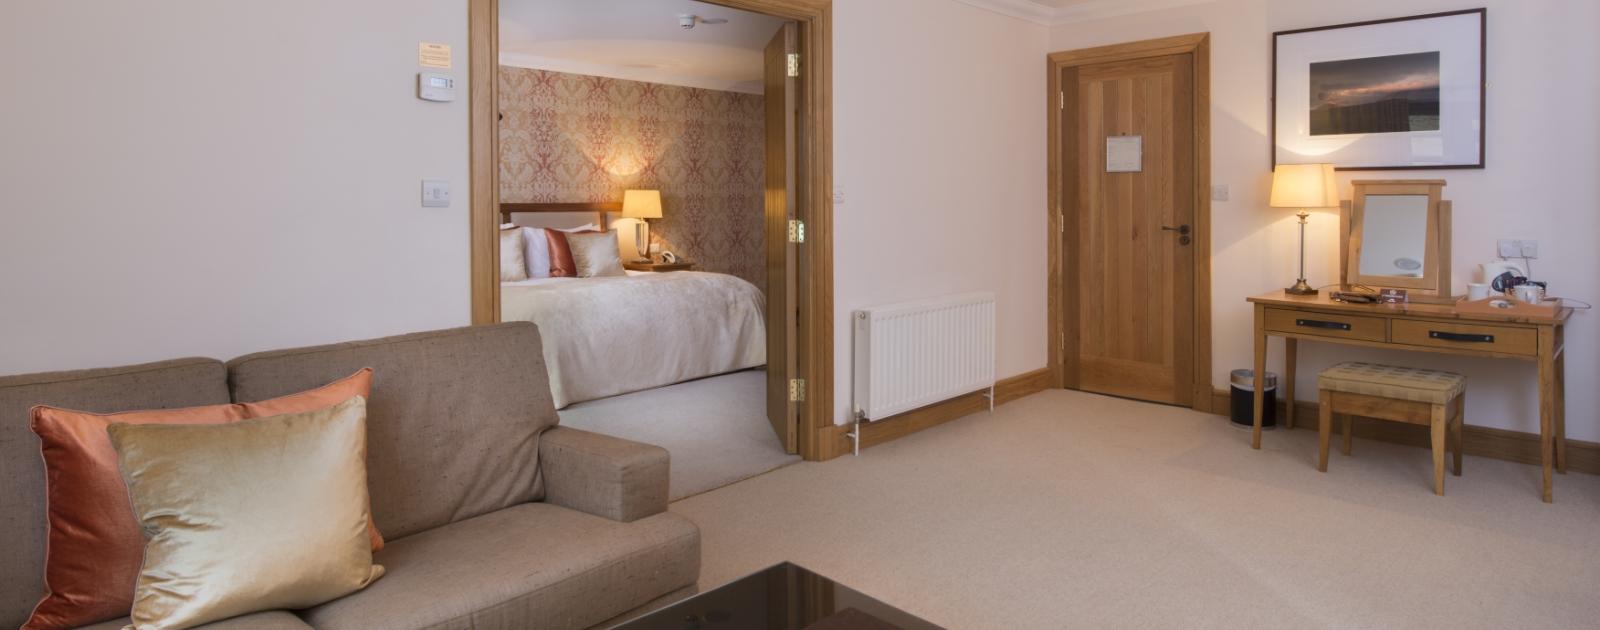 1-bedroom-suite-downstairs-banner